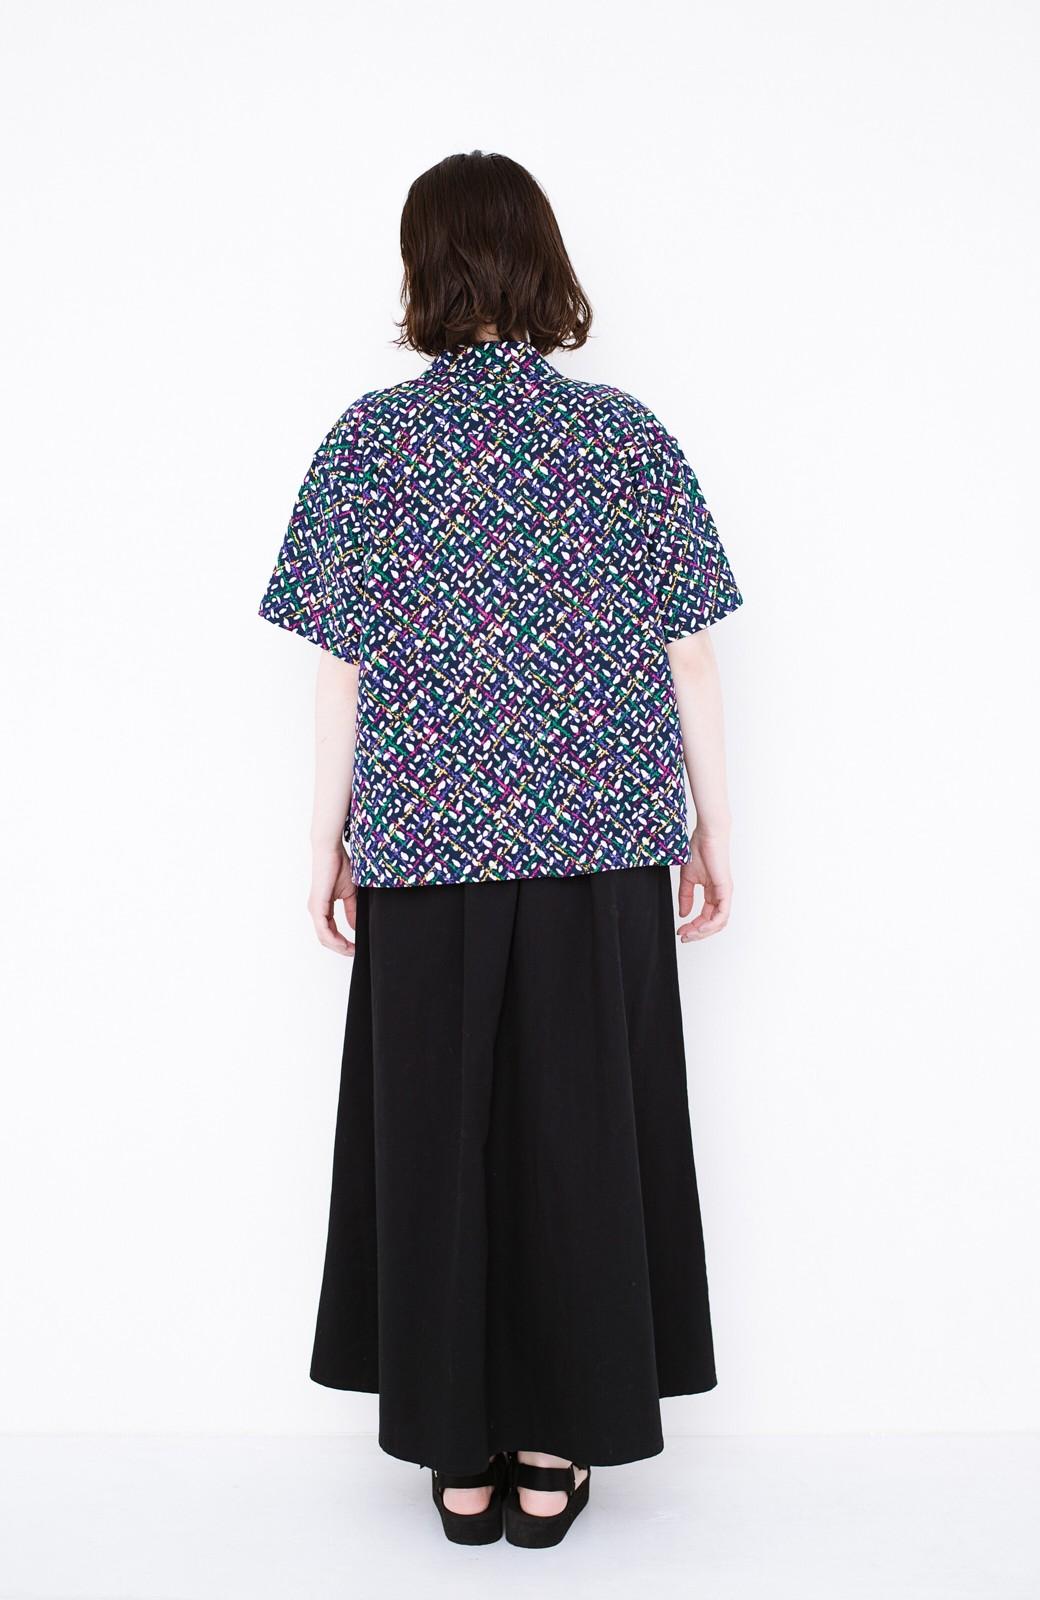 haco! 【今年も再販!】京都の浴衣屋さんと作った浴衣生地のシャツ <ネイビー>の商品写真9